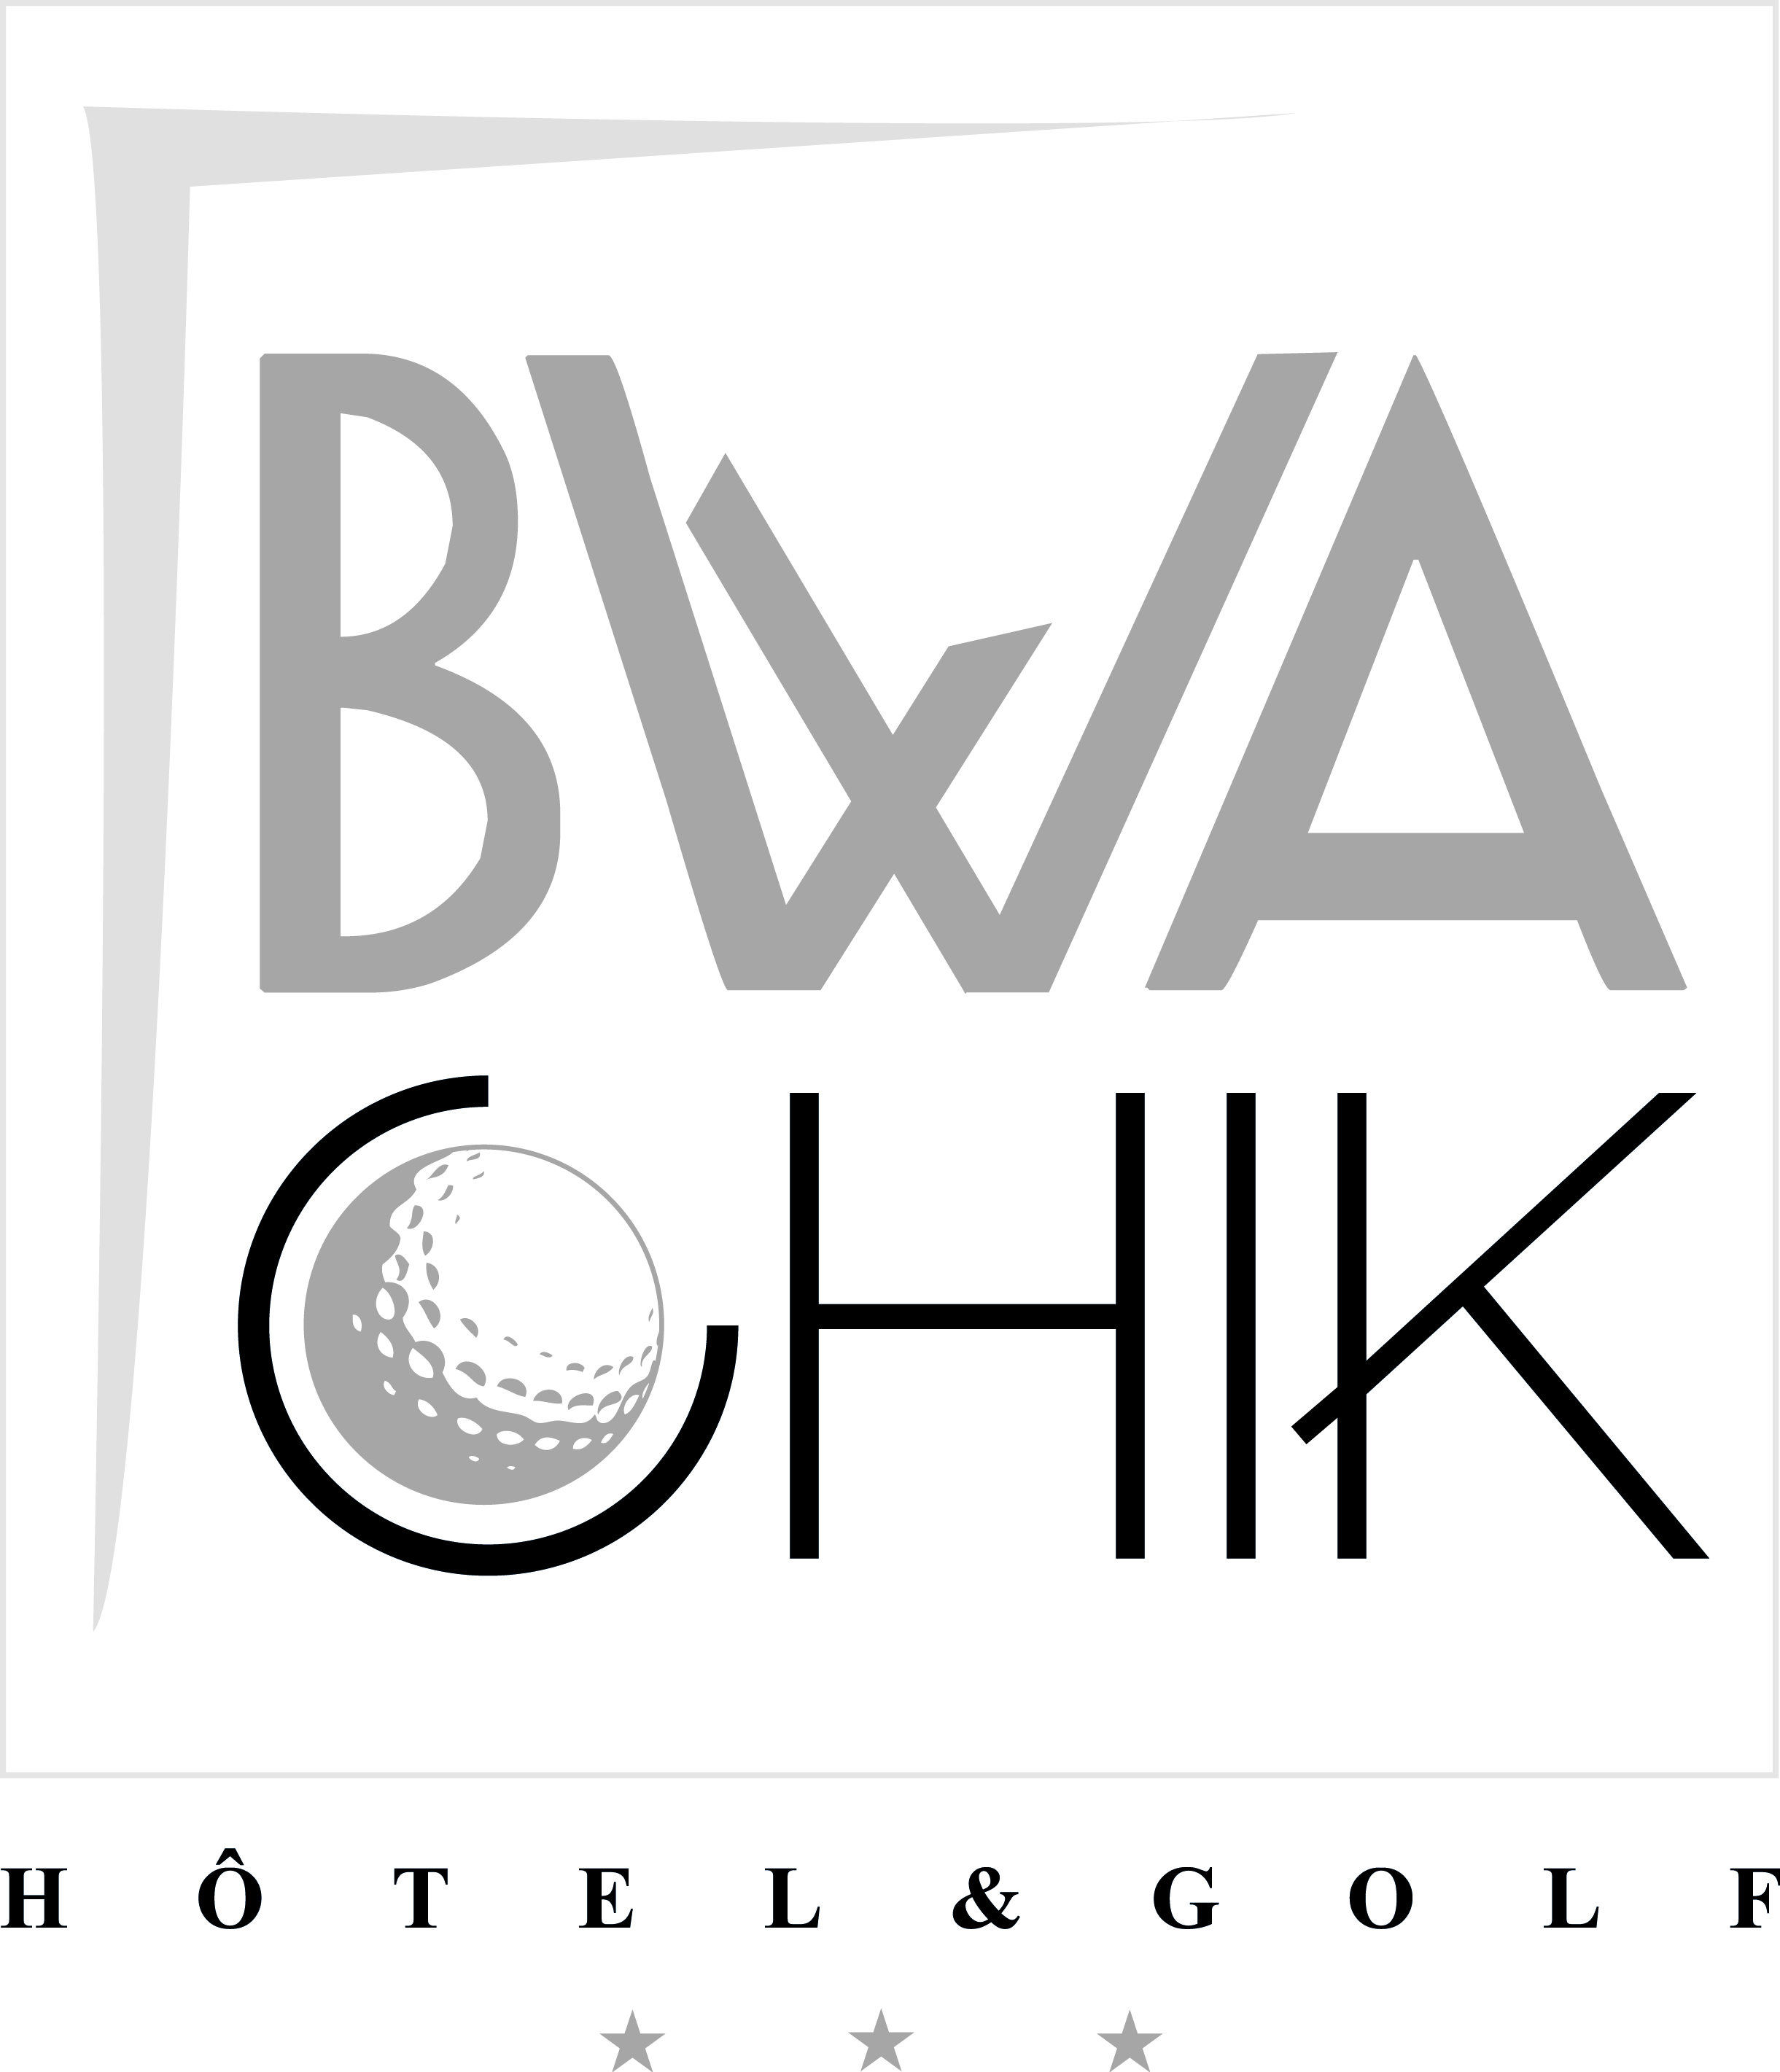 HOTEL BWA CHIK